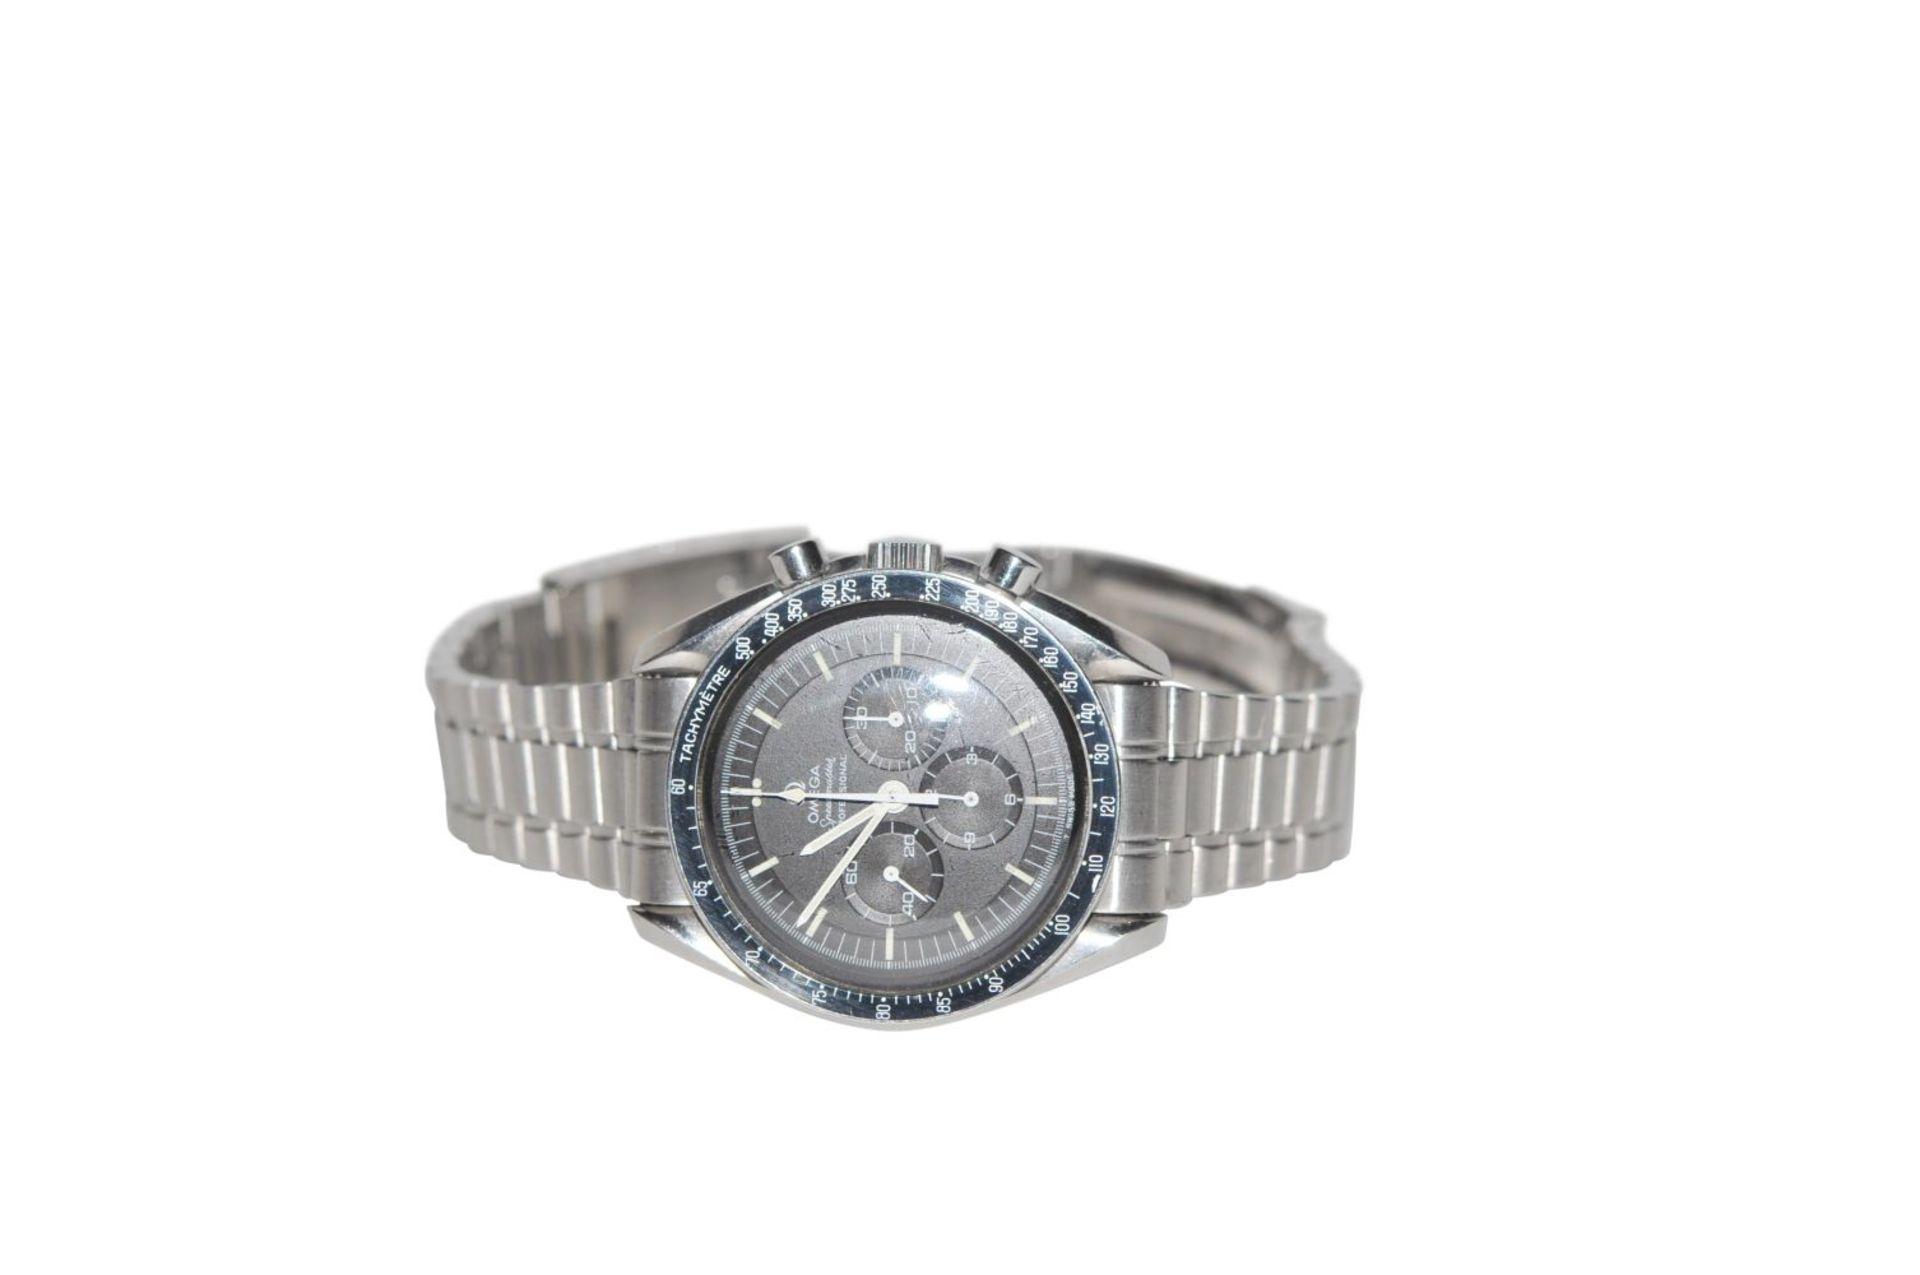 Los 28 - Omega Speedmaster Collector Moon Watch Speedmaster Professional Ref. 145022-69 ca 1980 Tritium